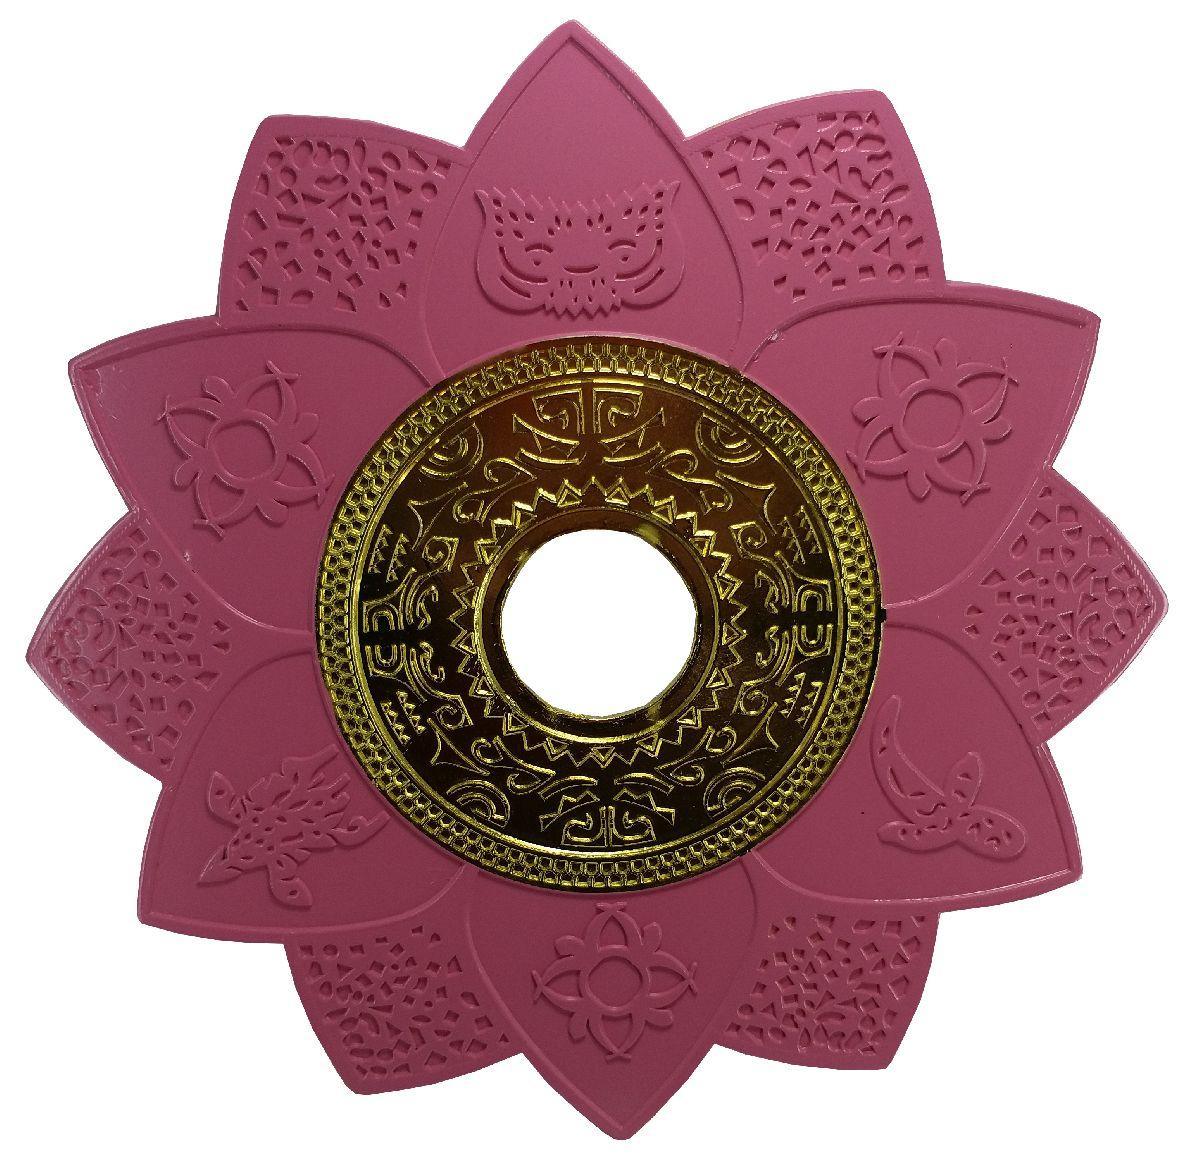 Prato Fumee 1718 Rosa c/ dourado